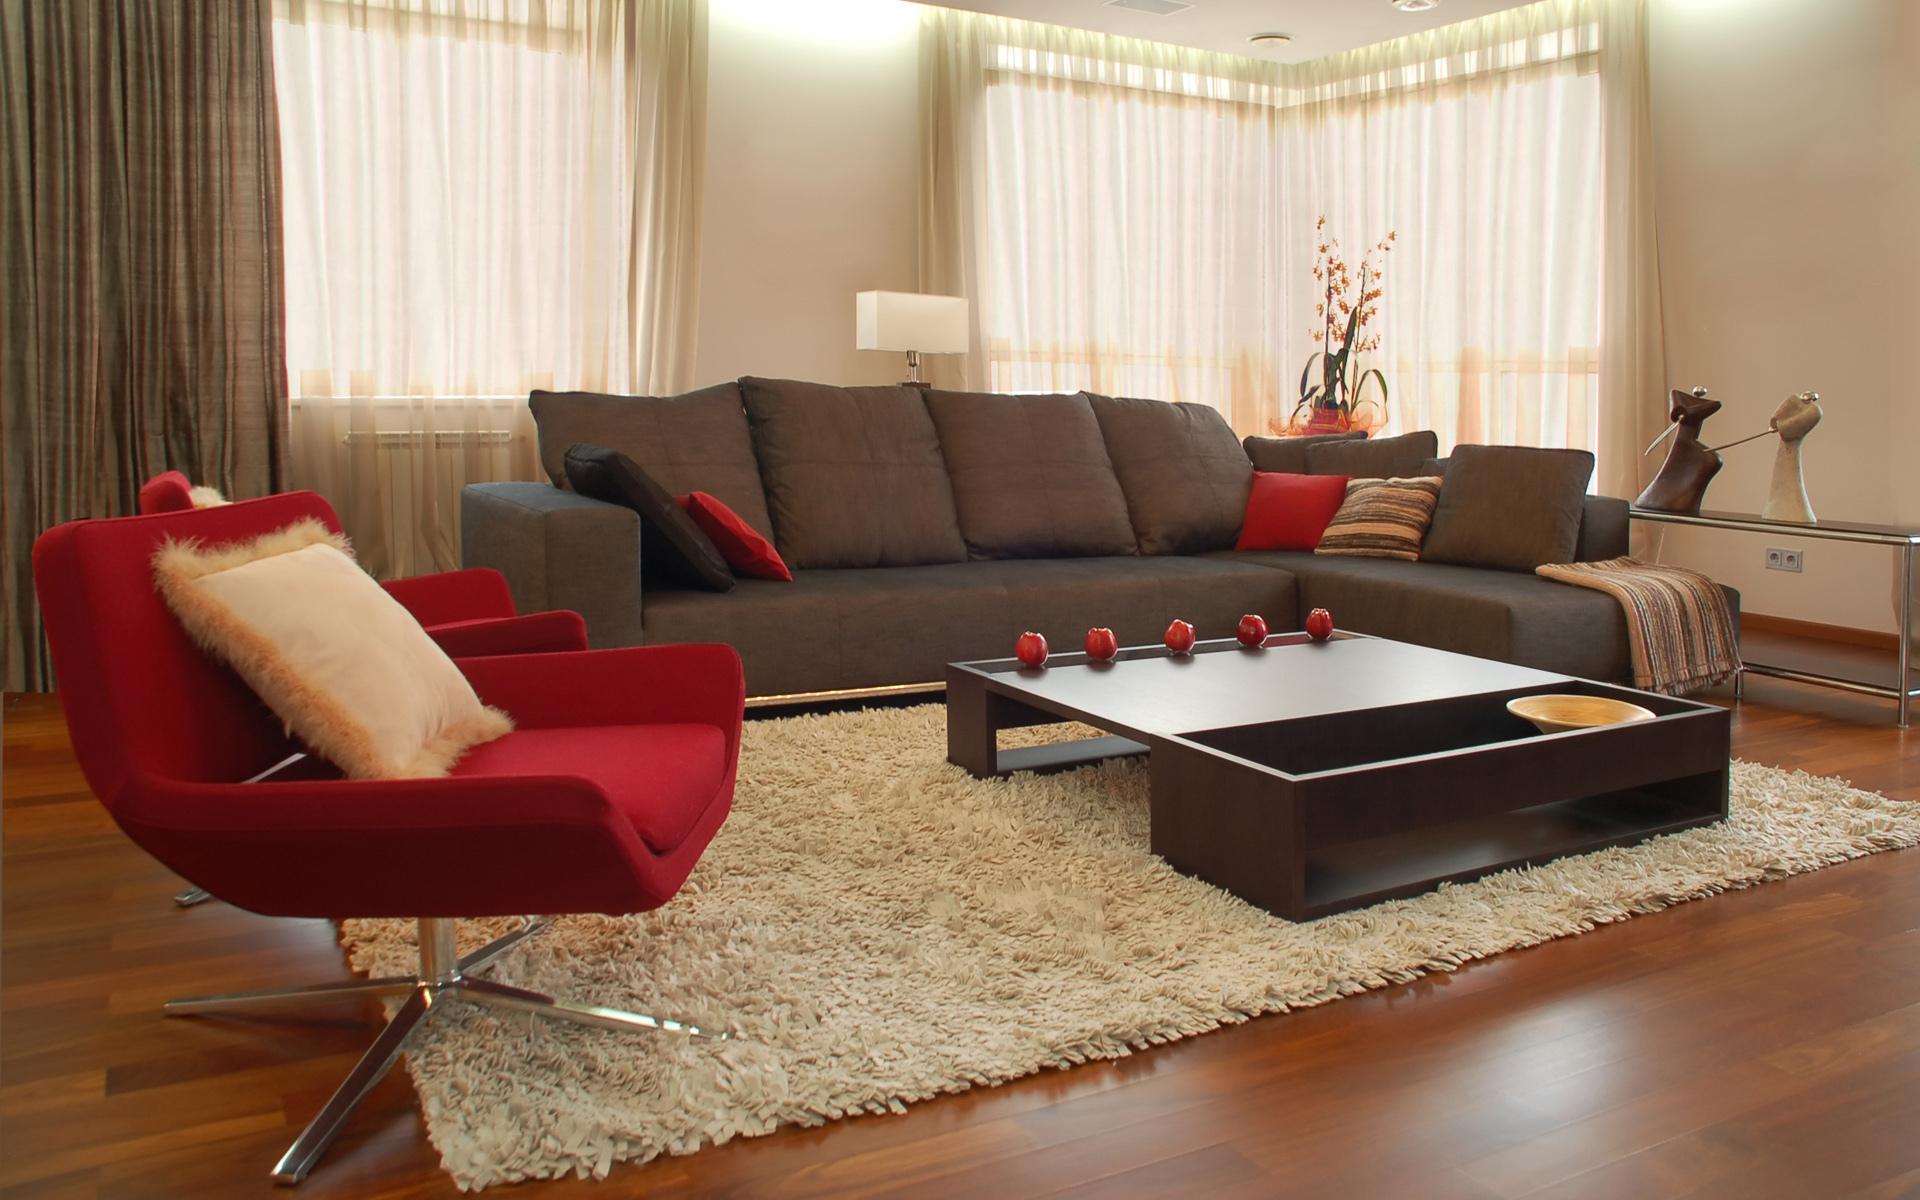 Тканевый диван в стиле модерн